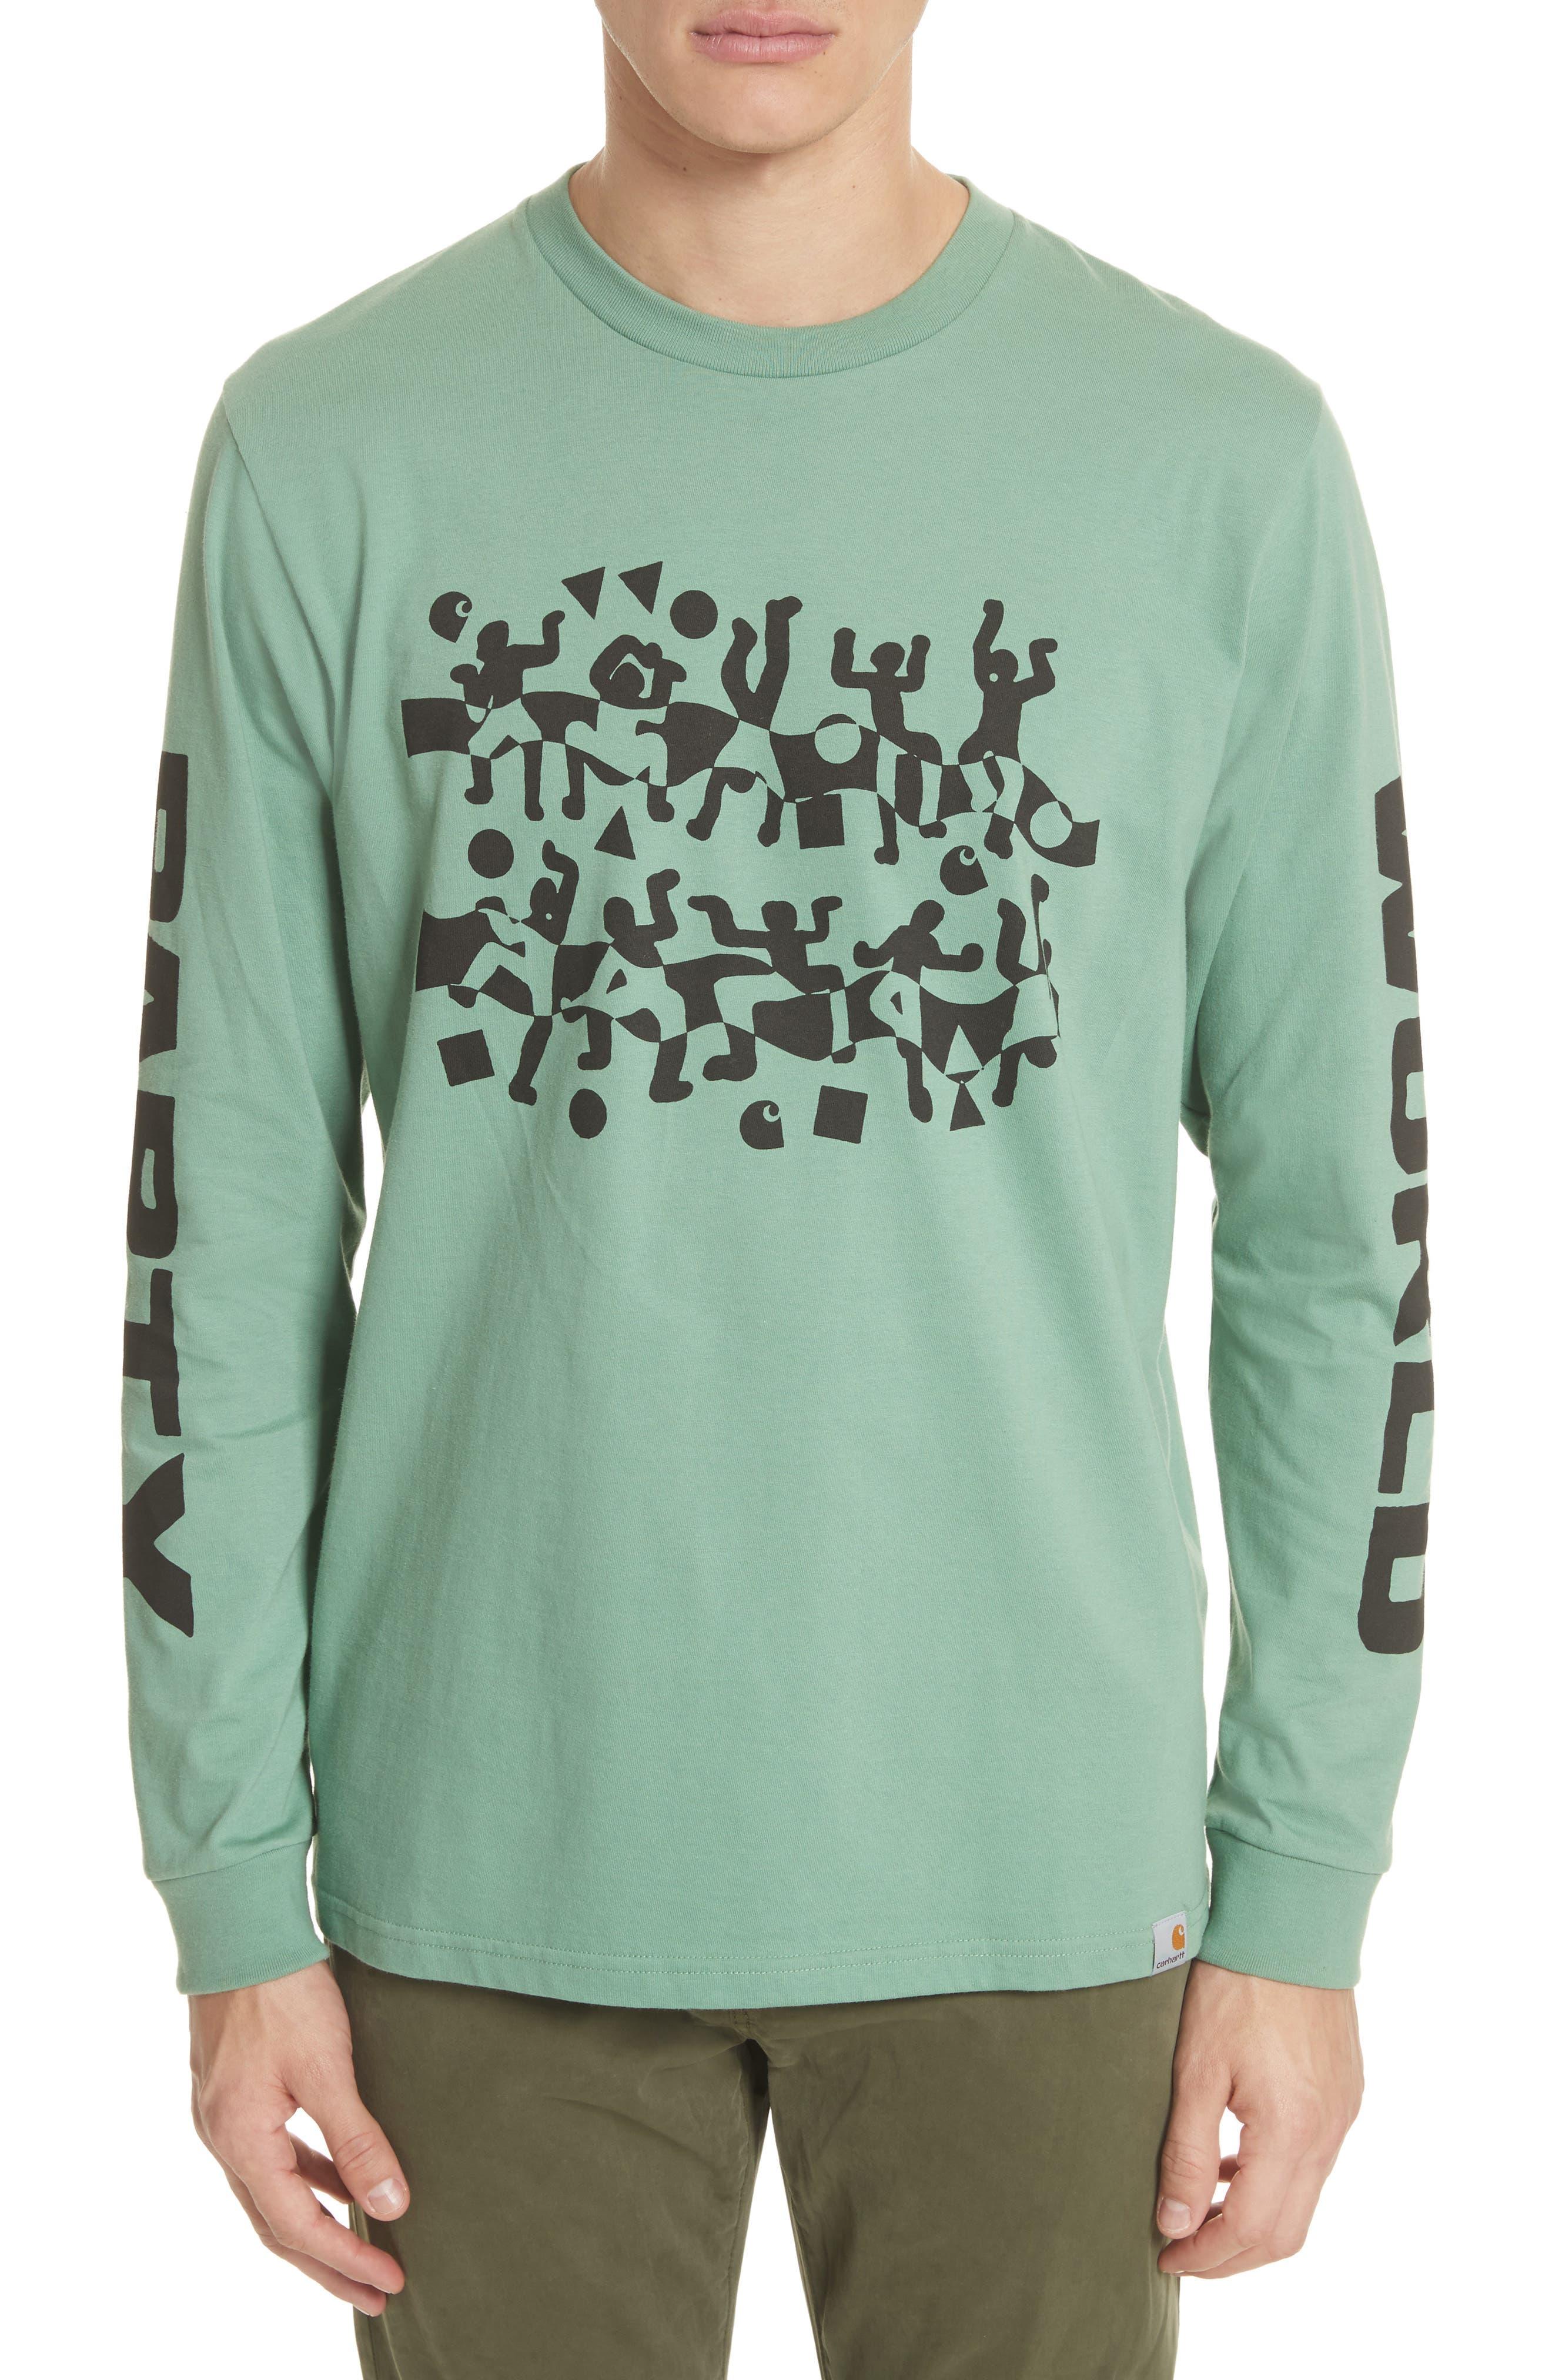 World Party T-Shirt,                         Main,                         color, Catnip/Black